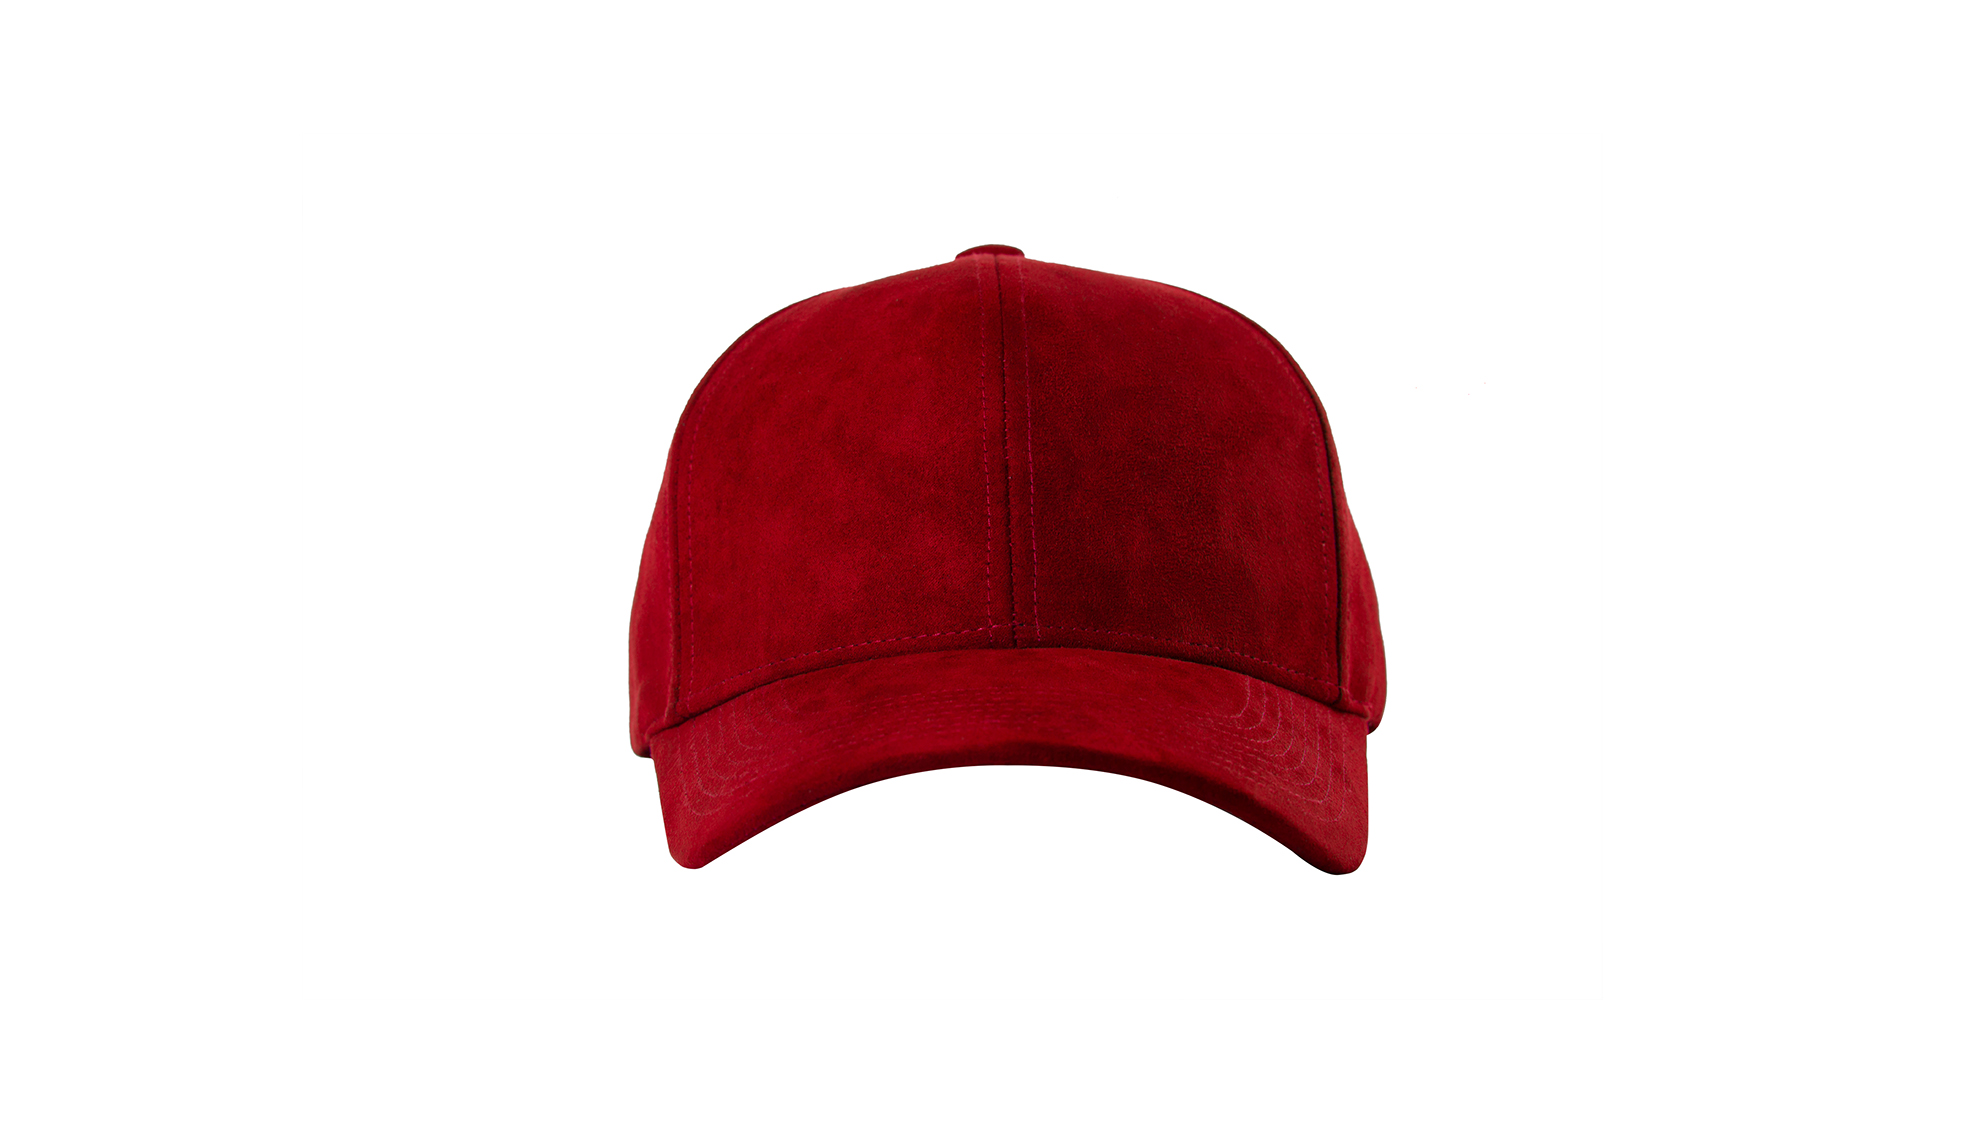 a56ecce6a31 DSLINE BASEBALL CAP RED SUEDE   GOLD - DSLINE BASICS